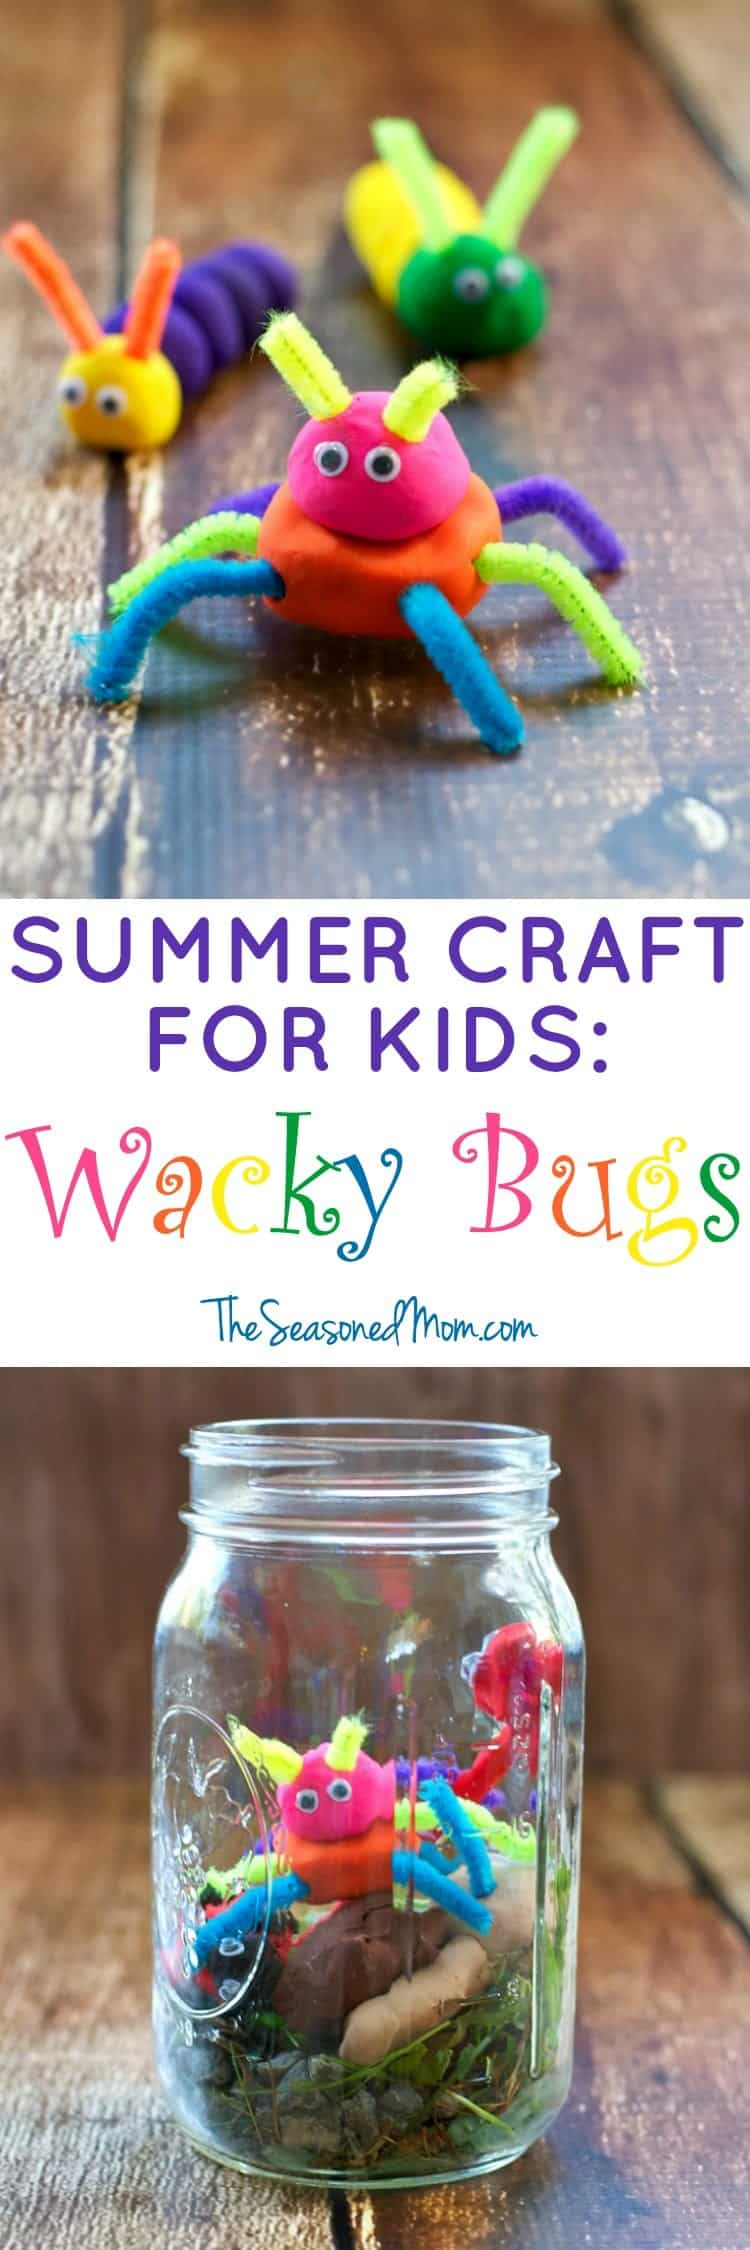 Summer Craft for Kids: Wacky Bugs - The Seasoned Mom